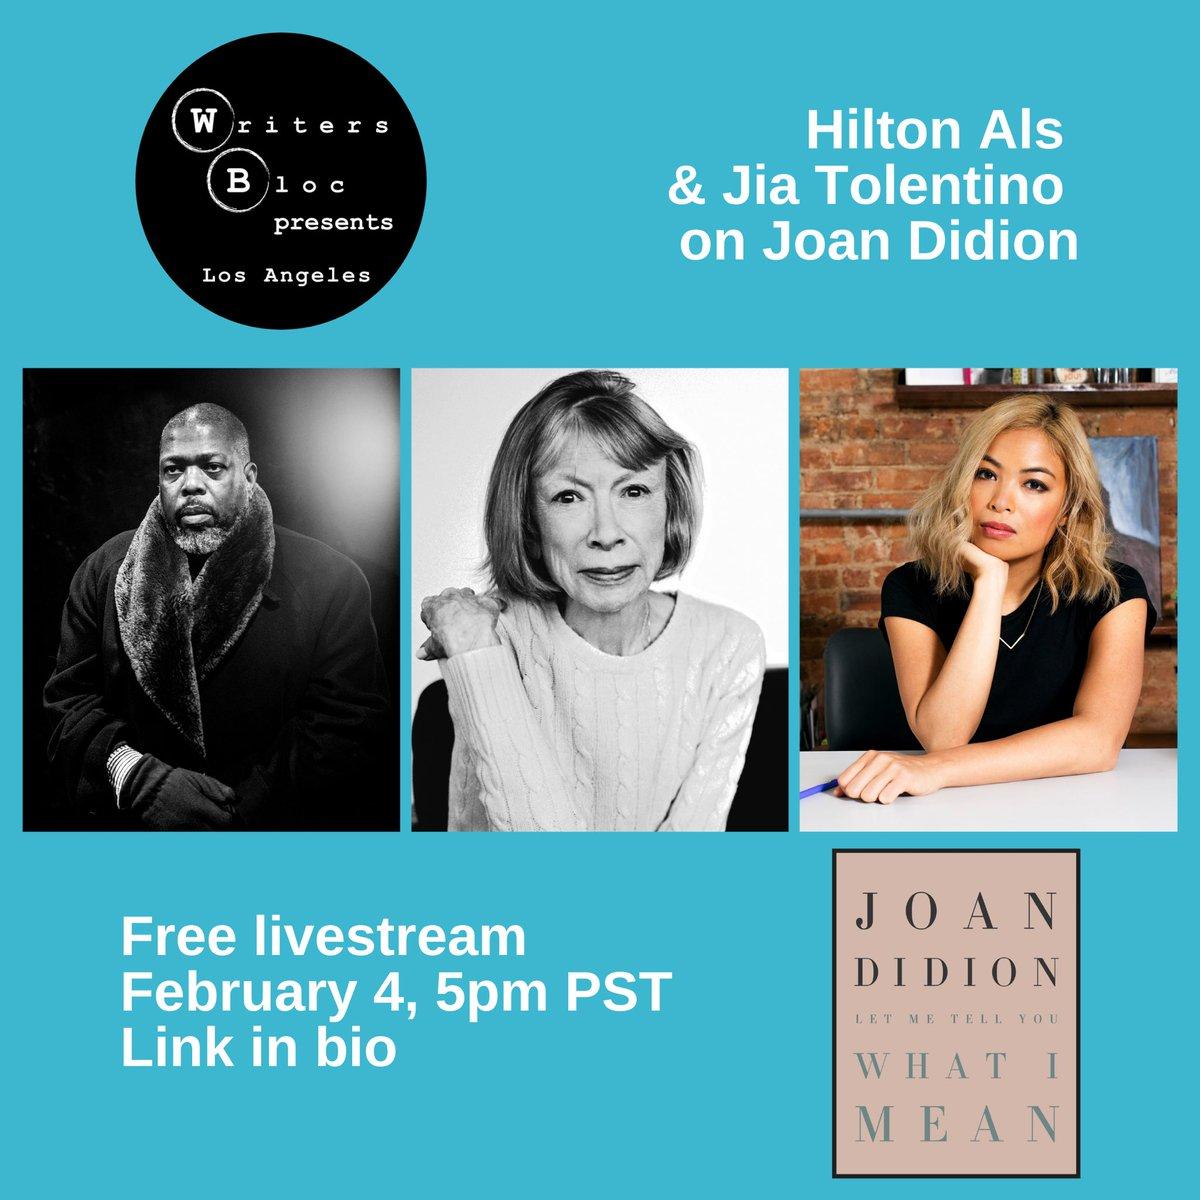 Just announced! #HiltonAls & @jiatolentino on #JoanDidion. Free livestream on Feb. 4. Books sold by @skylightbooks.